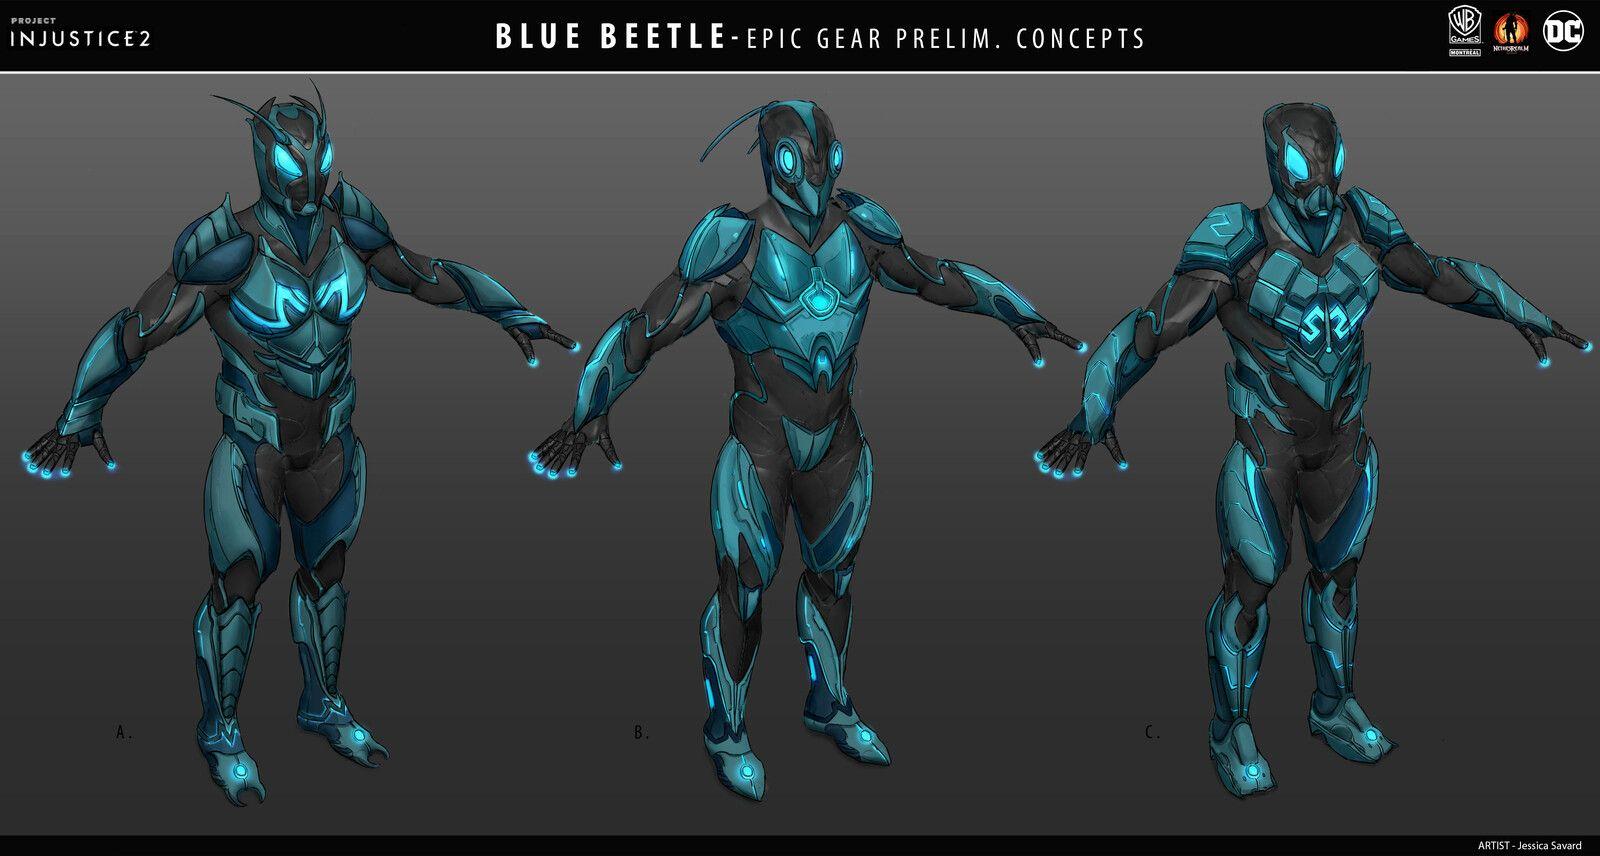 Blue Beetle Gear For Injustice 2 Jessica Savard On Artstation At Https Www Artstation Com Artwork E0zq4w Blue Beetle Design Comics Dc Comics Art